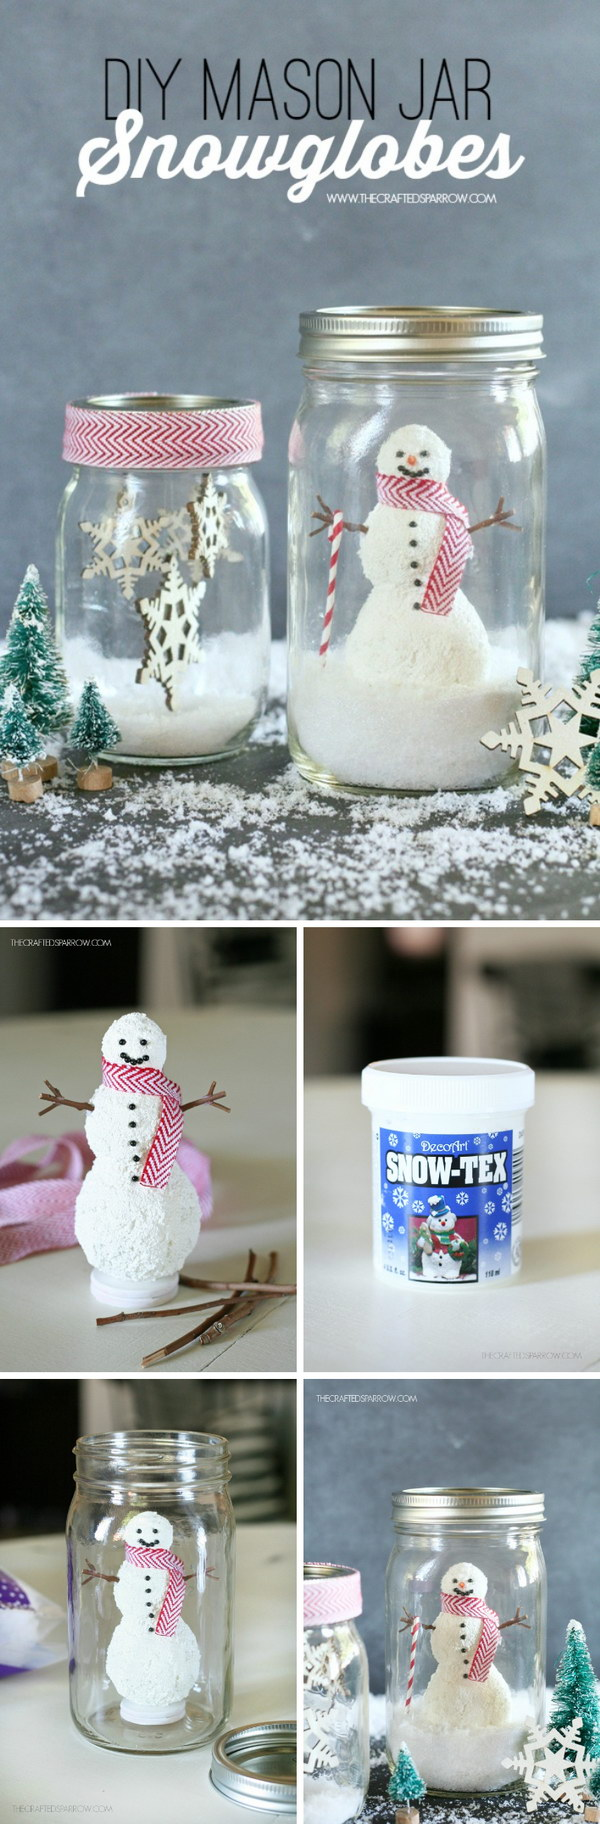 DIY Mason Jar Snowglobes.